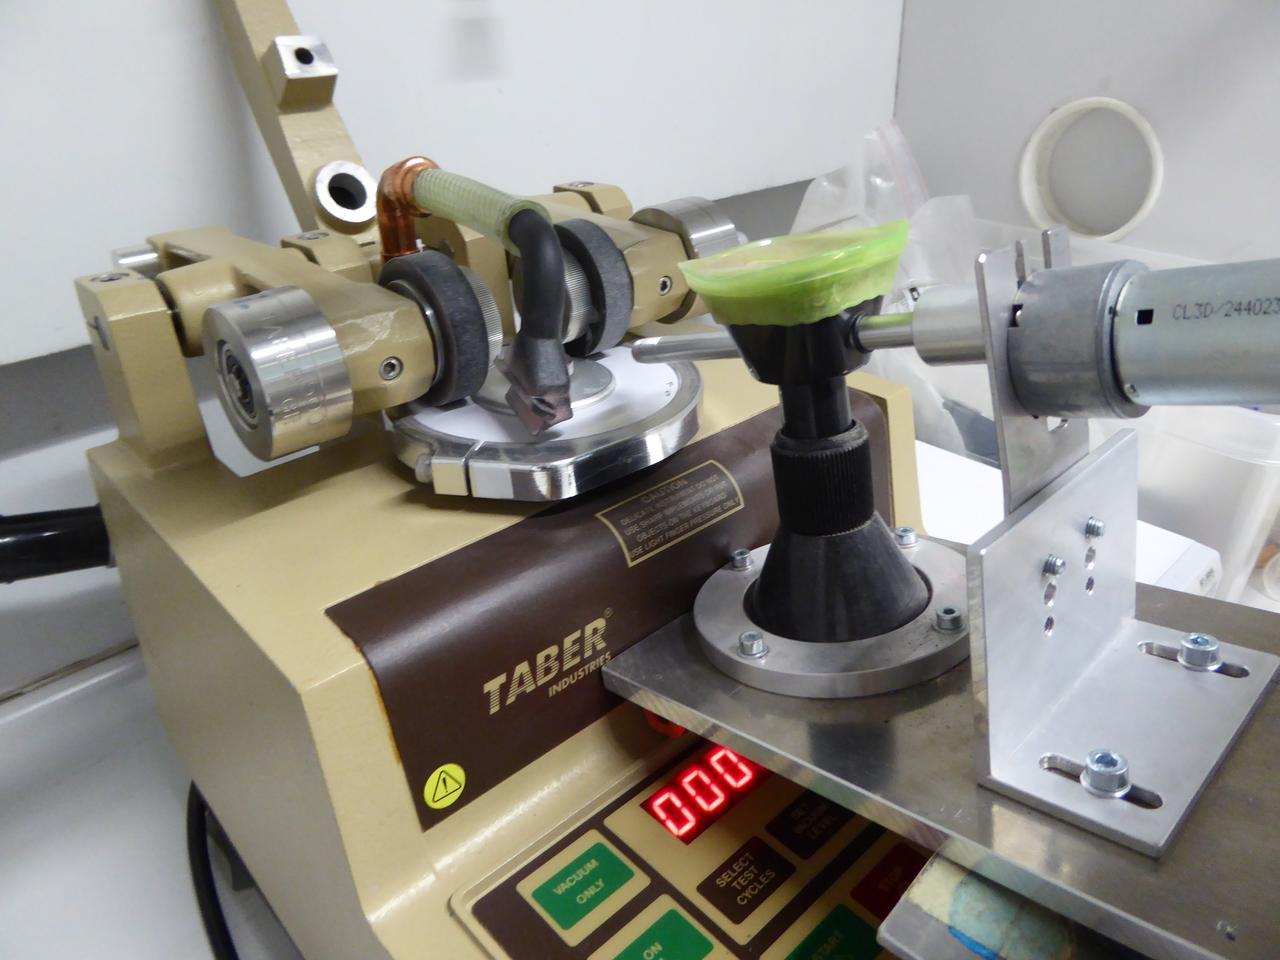 An abrasion testing machine